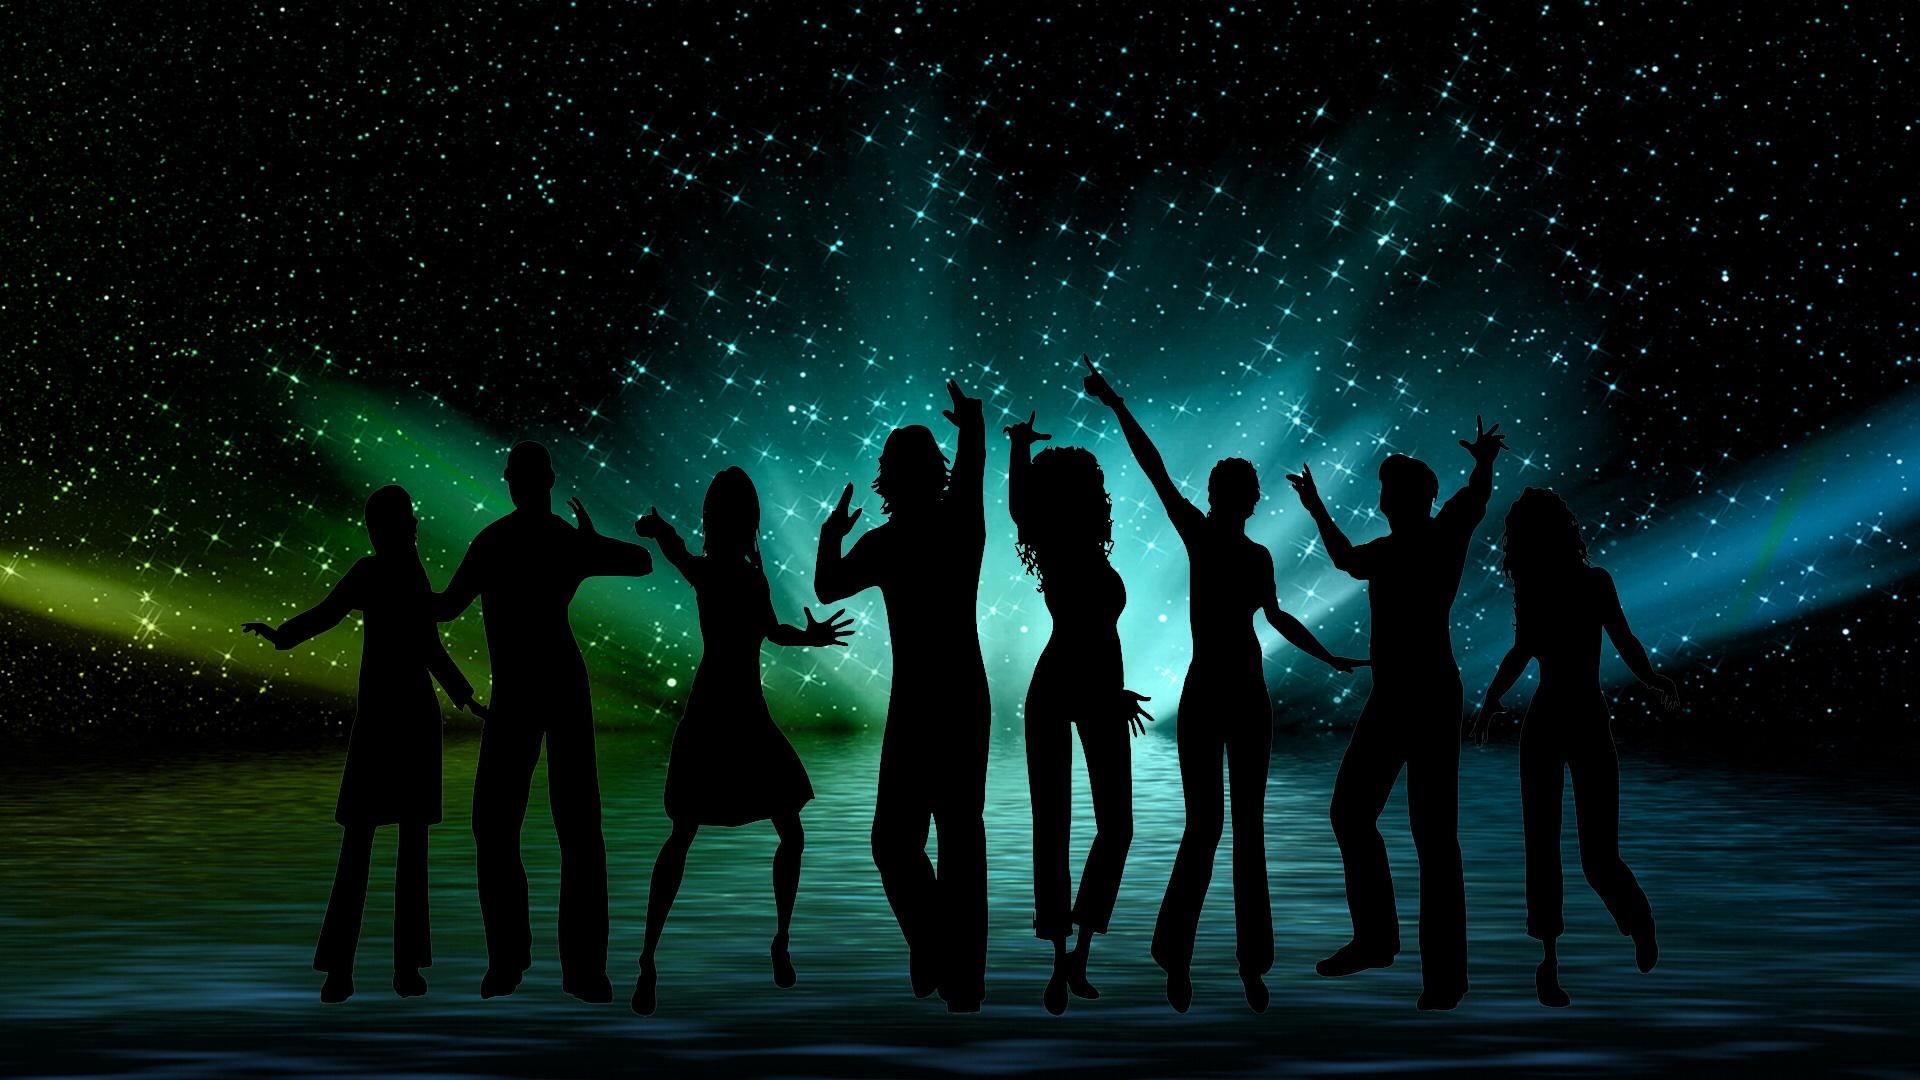 party! bilder party all night hd hintergrund and background fotos